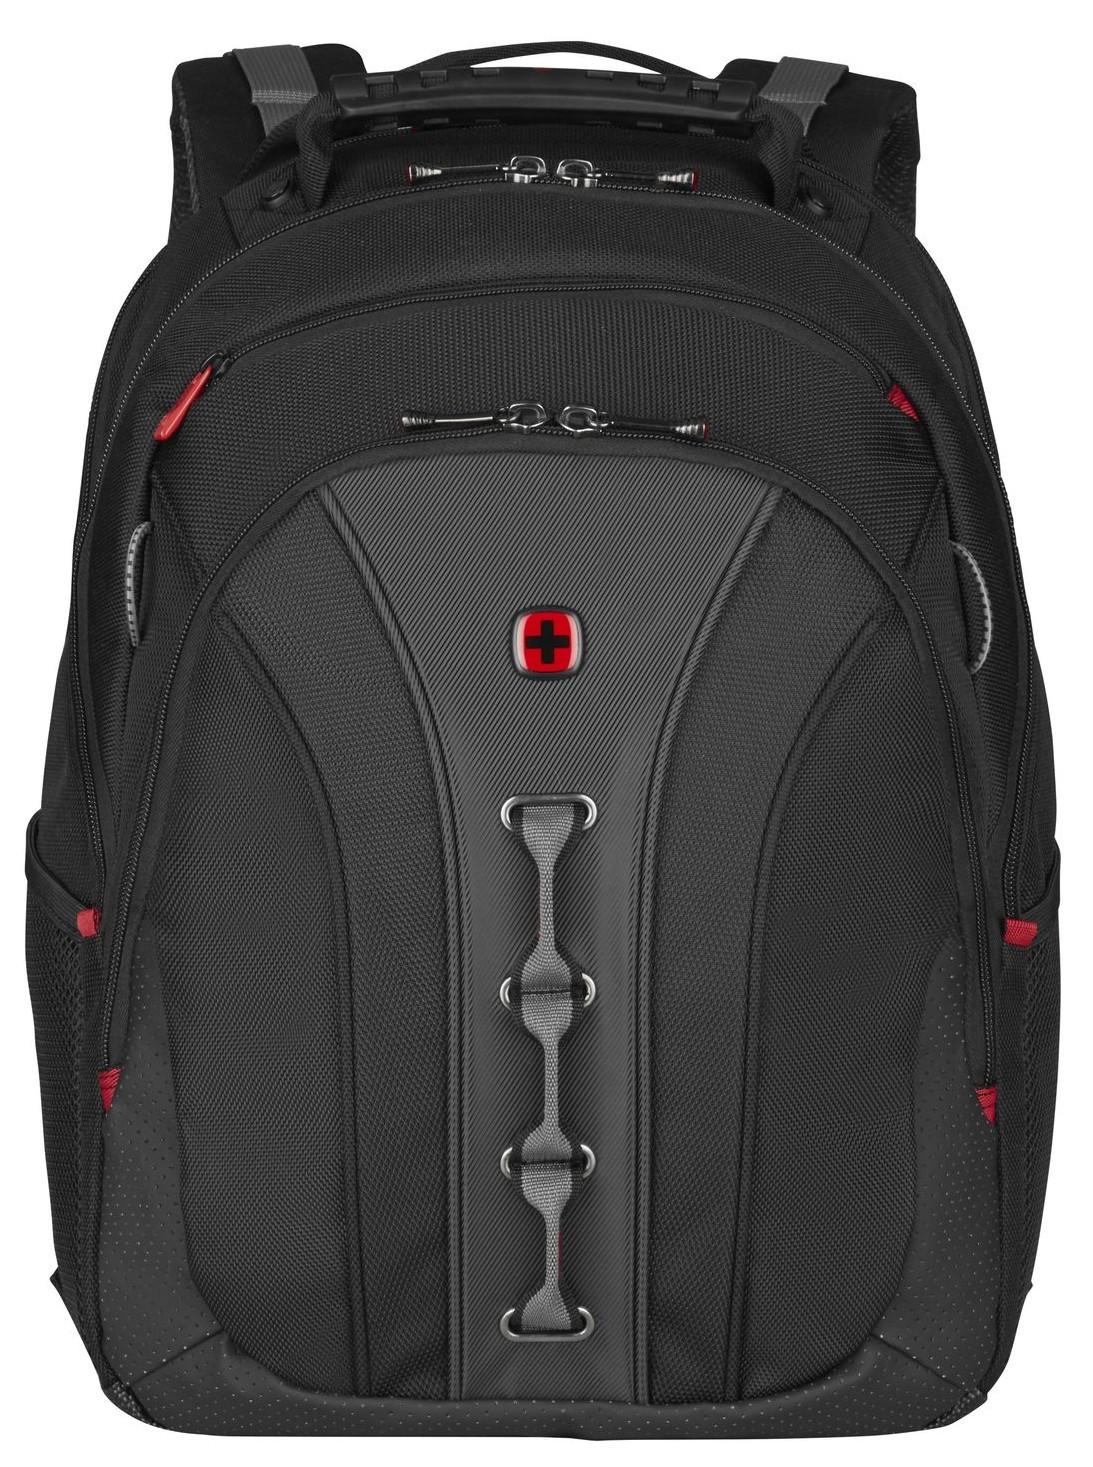 Wenger SwissGear Backpack LEGACY